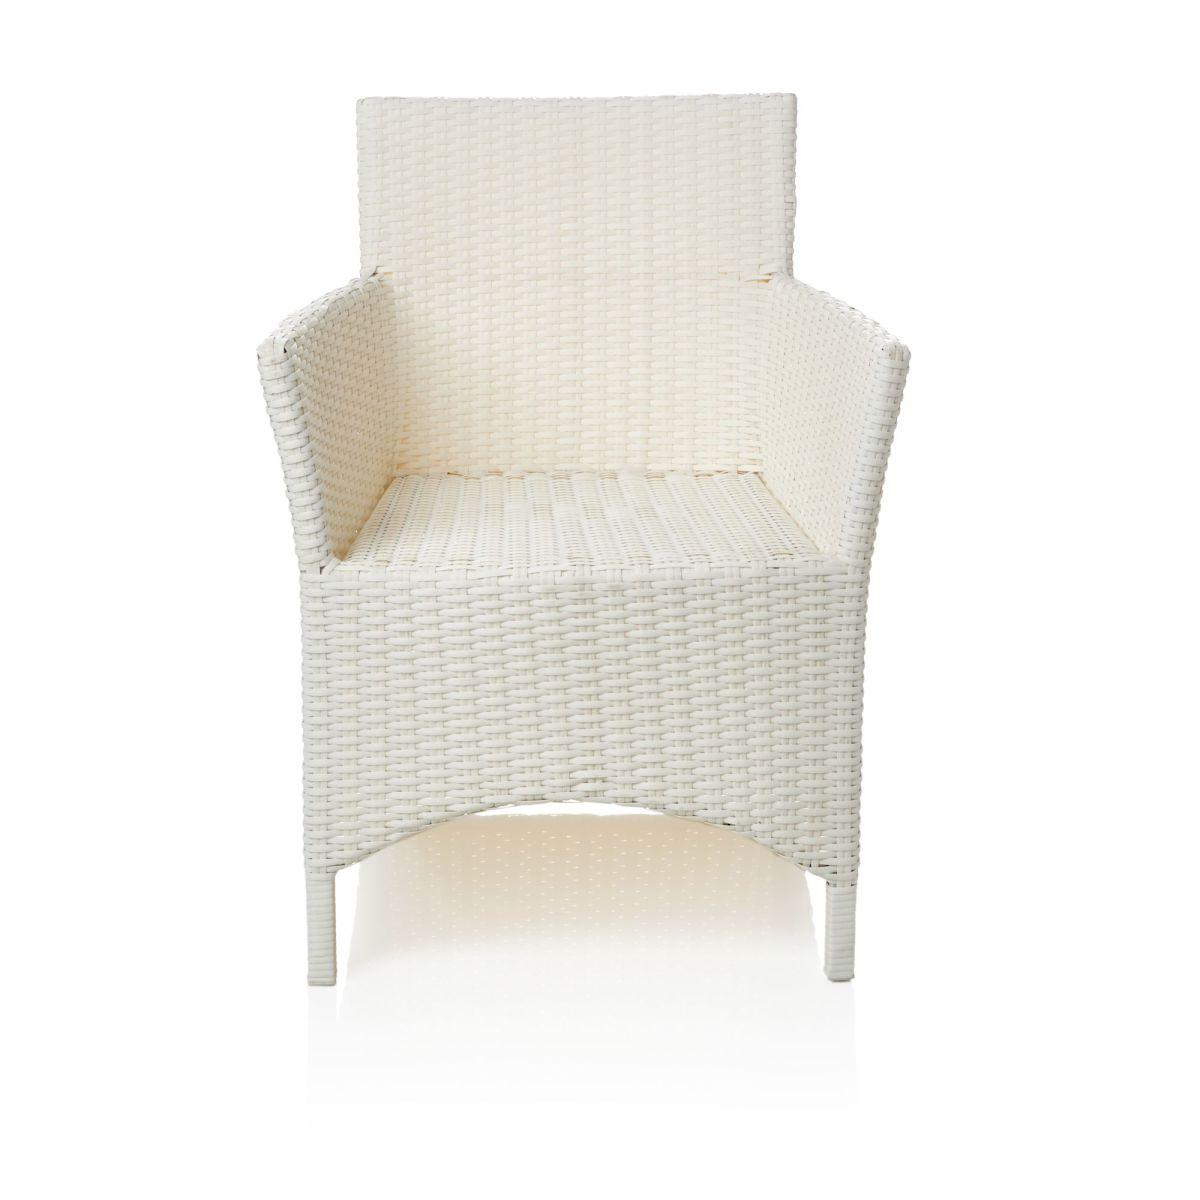 Outdoor-Armlehnstuhl, inkl. Auflagen, Kunststoffgeflecht (Impressionen)